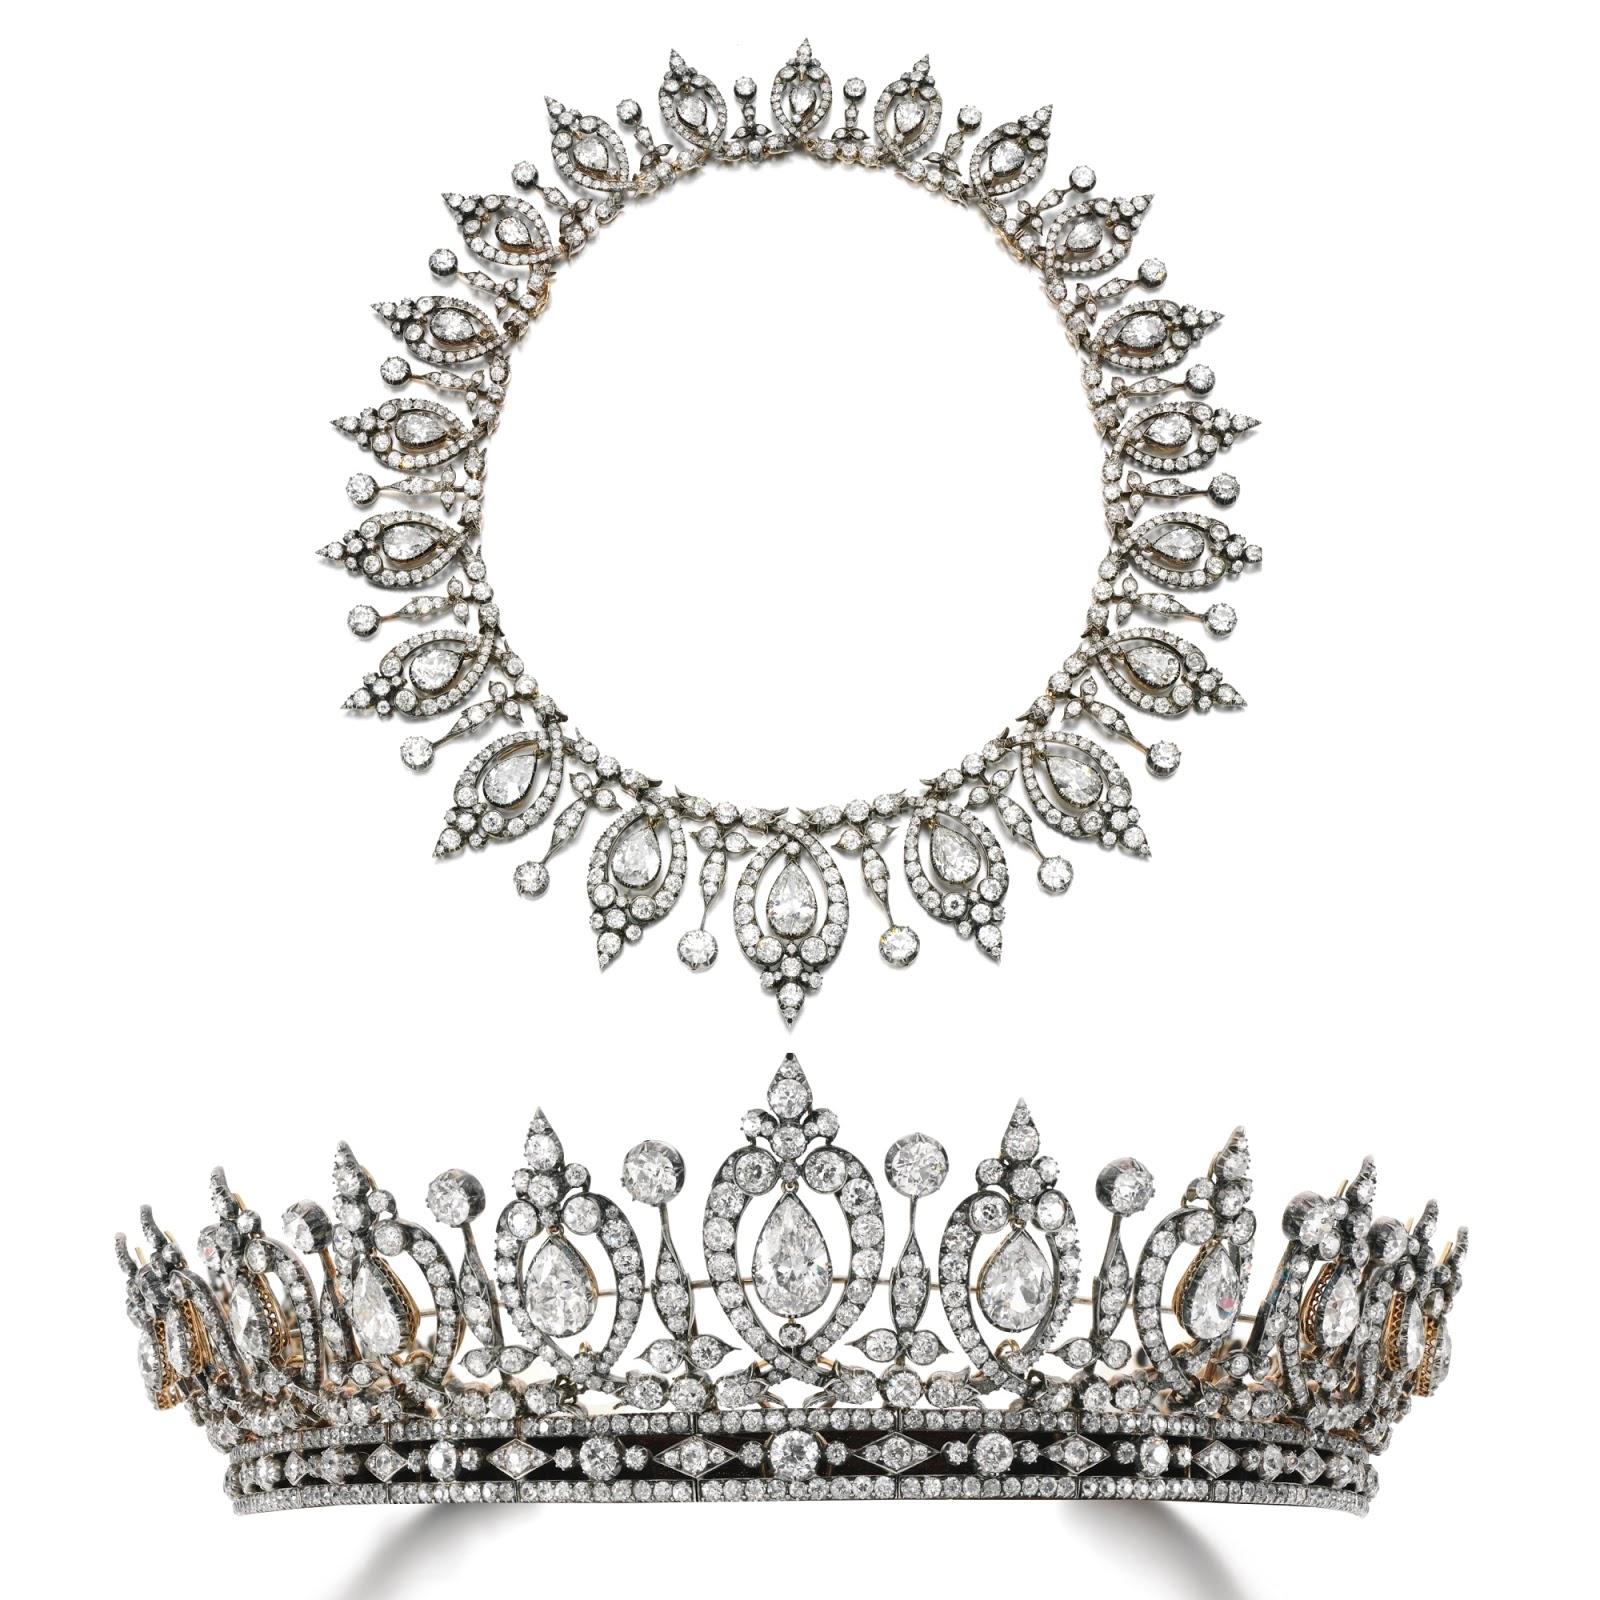 تيجان ملكية  امبراطورية فاخرة Diamond%2Btiara%3Anecklace%2C%2Blast%2Bquarter%2Bof%2Bthe%2B19th%2Bcentury%2Bmary%2C%2Bduchess%2Bof%2Broxburghe